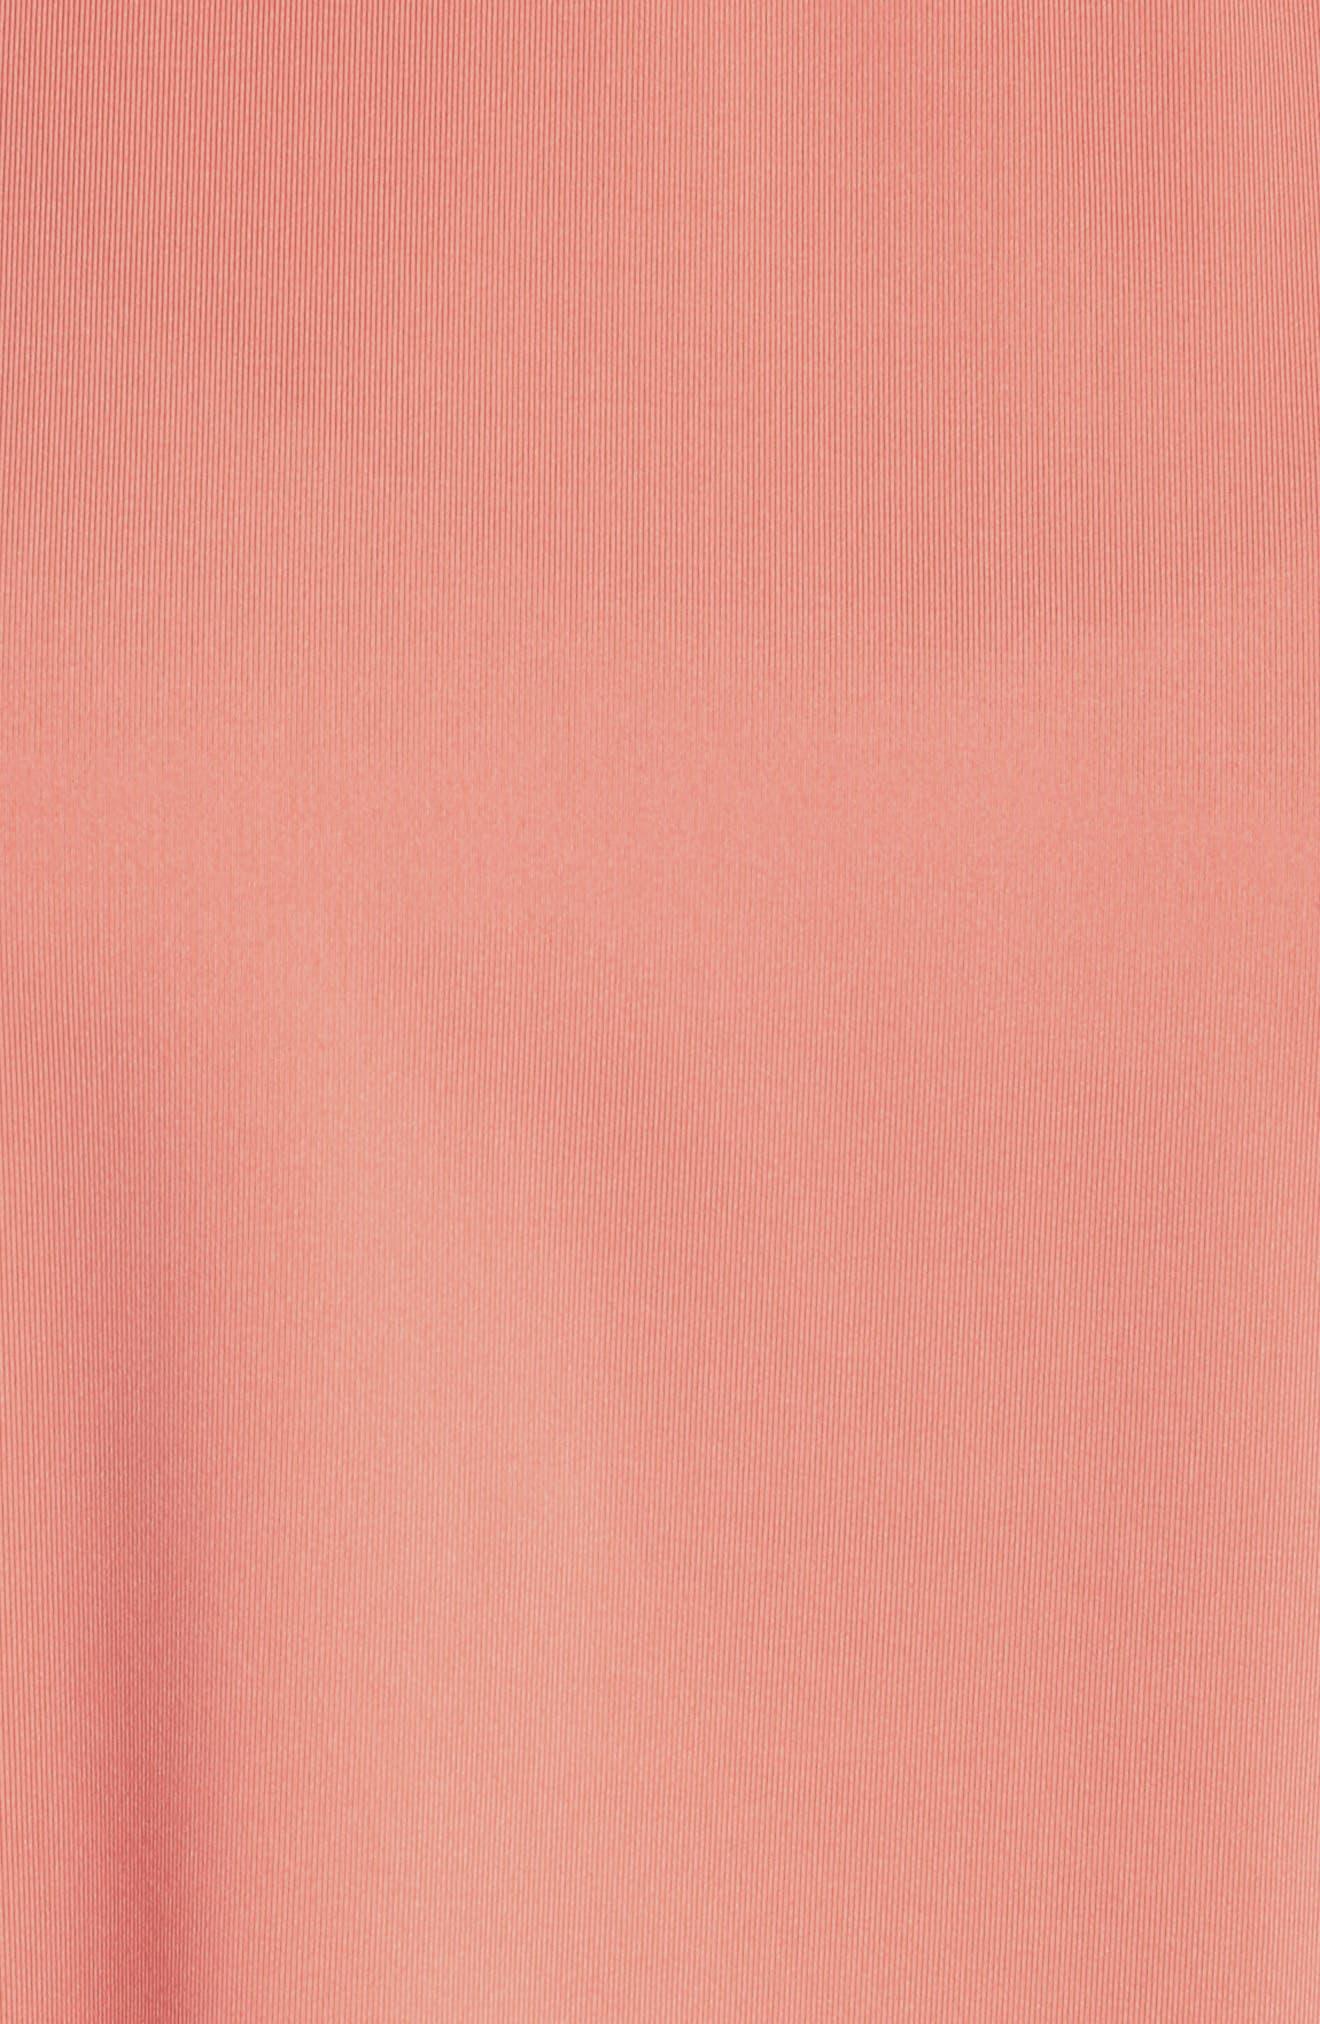 Banda Loose Tee,                             Alternate thumbnail 6, color,                             Pink Dk. Peach/ White